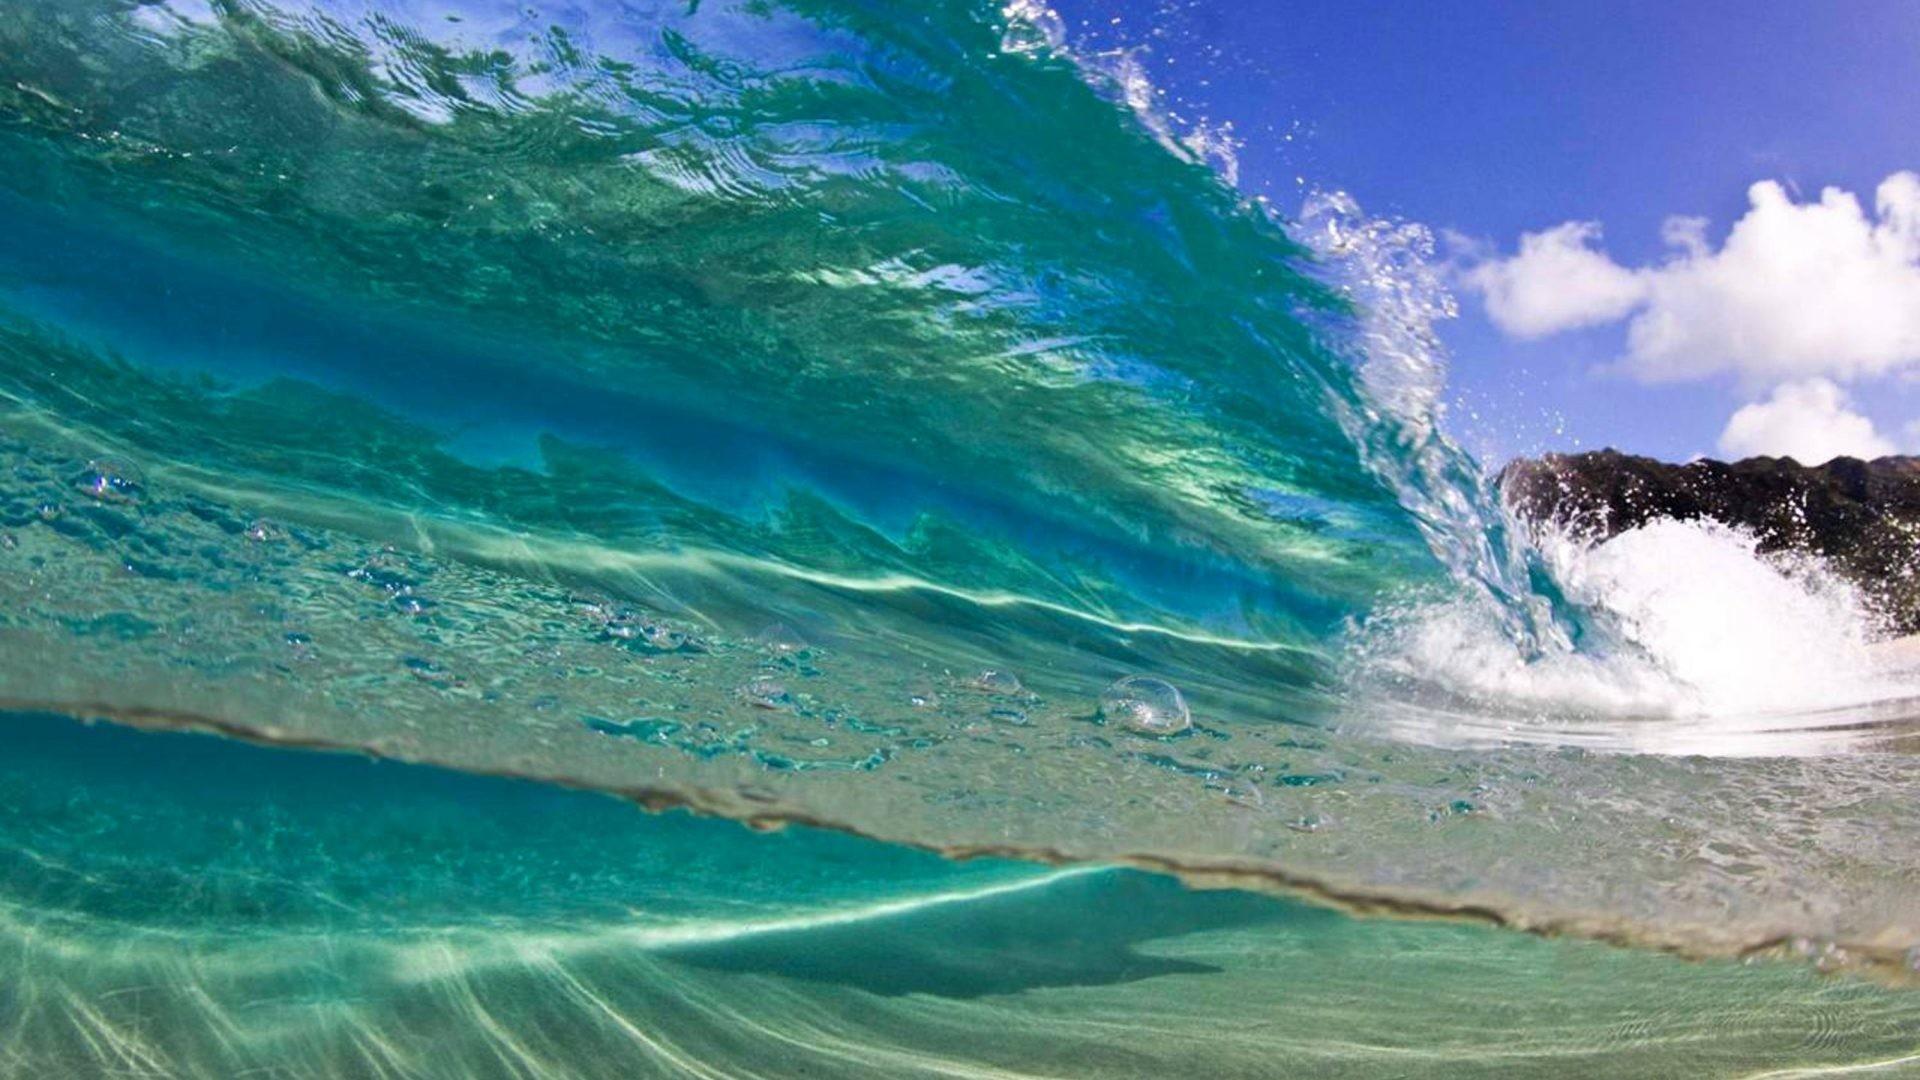 Surfer Tag – Aqua Wave Hawaiian Surfer Ocean Curl Polynesia Breakers Tide  Island Islands Sea Blue